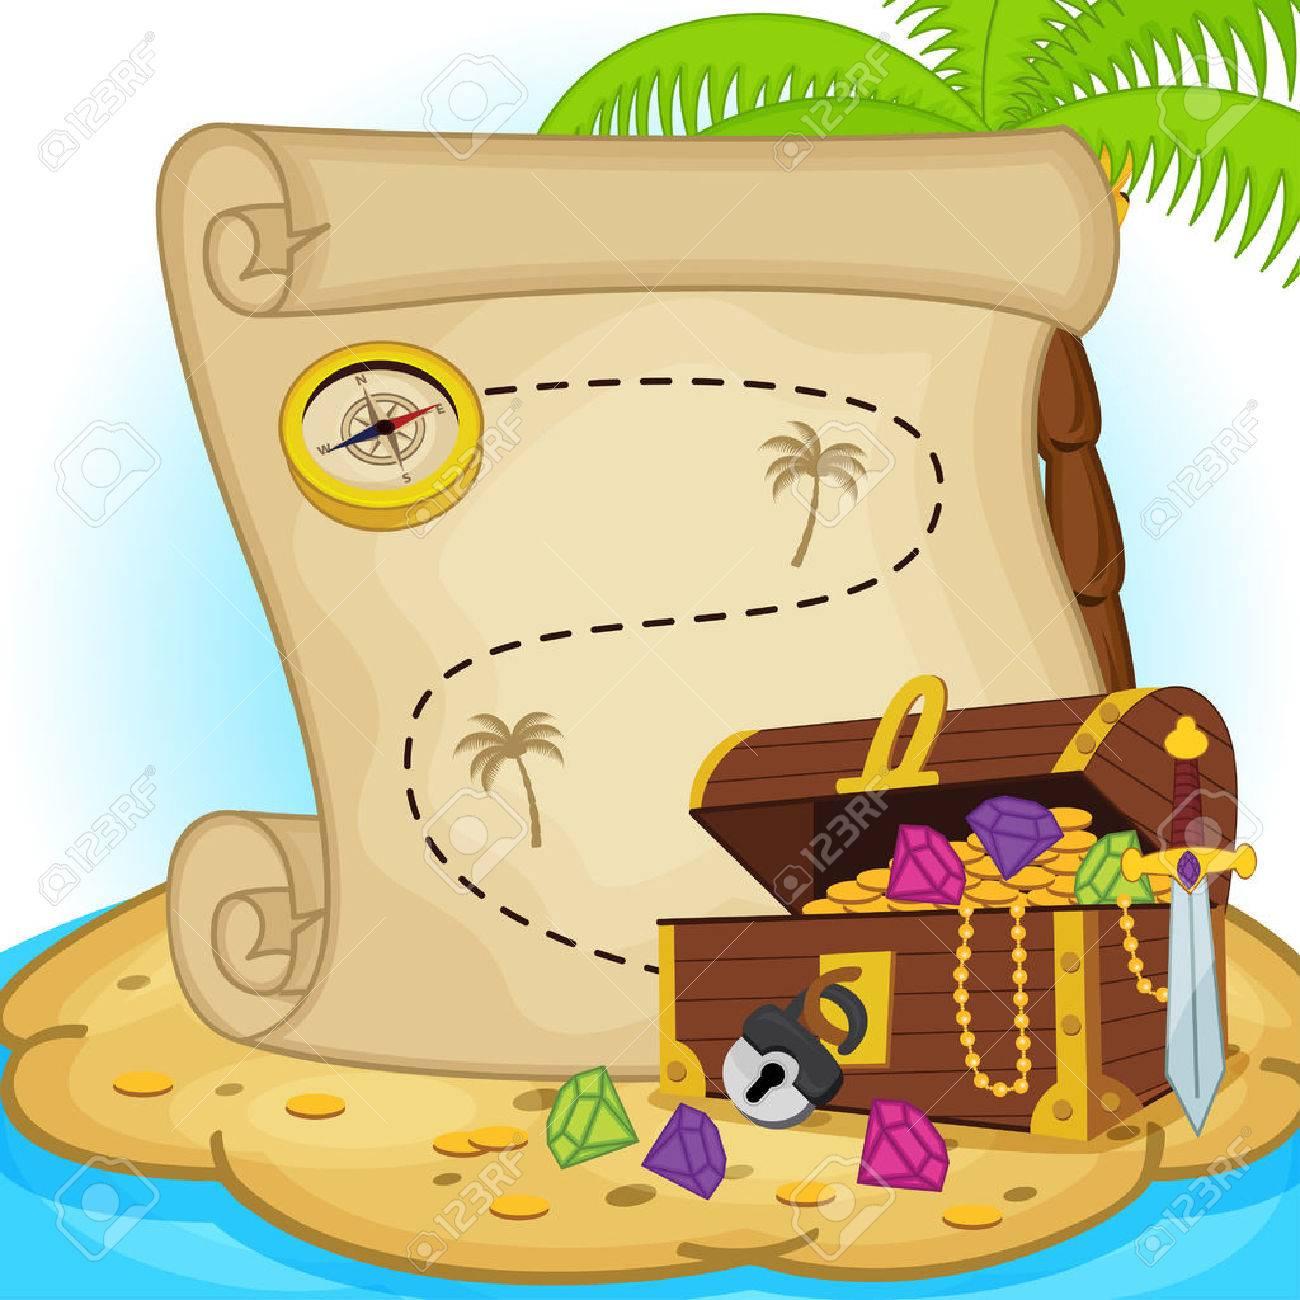 treasure map and treasure chest on island - vector illustration, eps Standard-Bild - 35796462